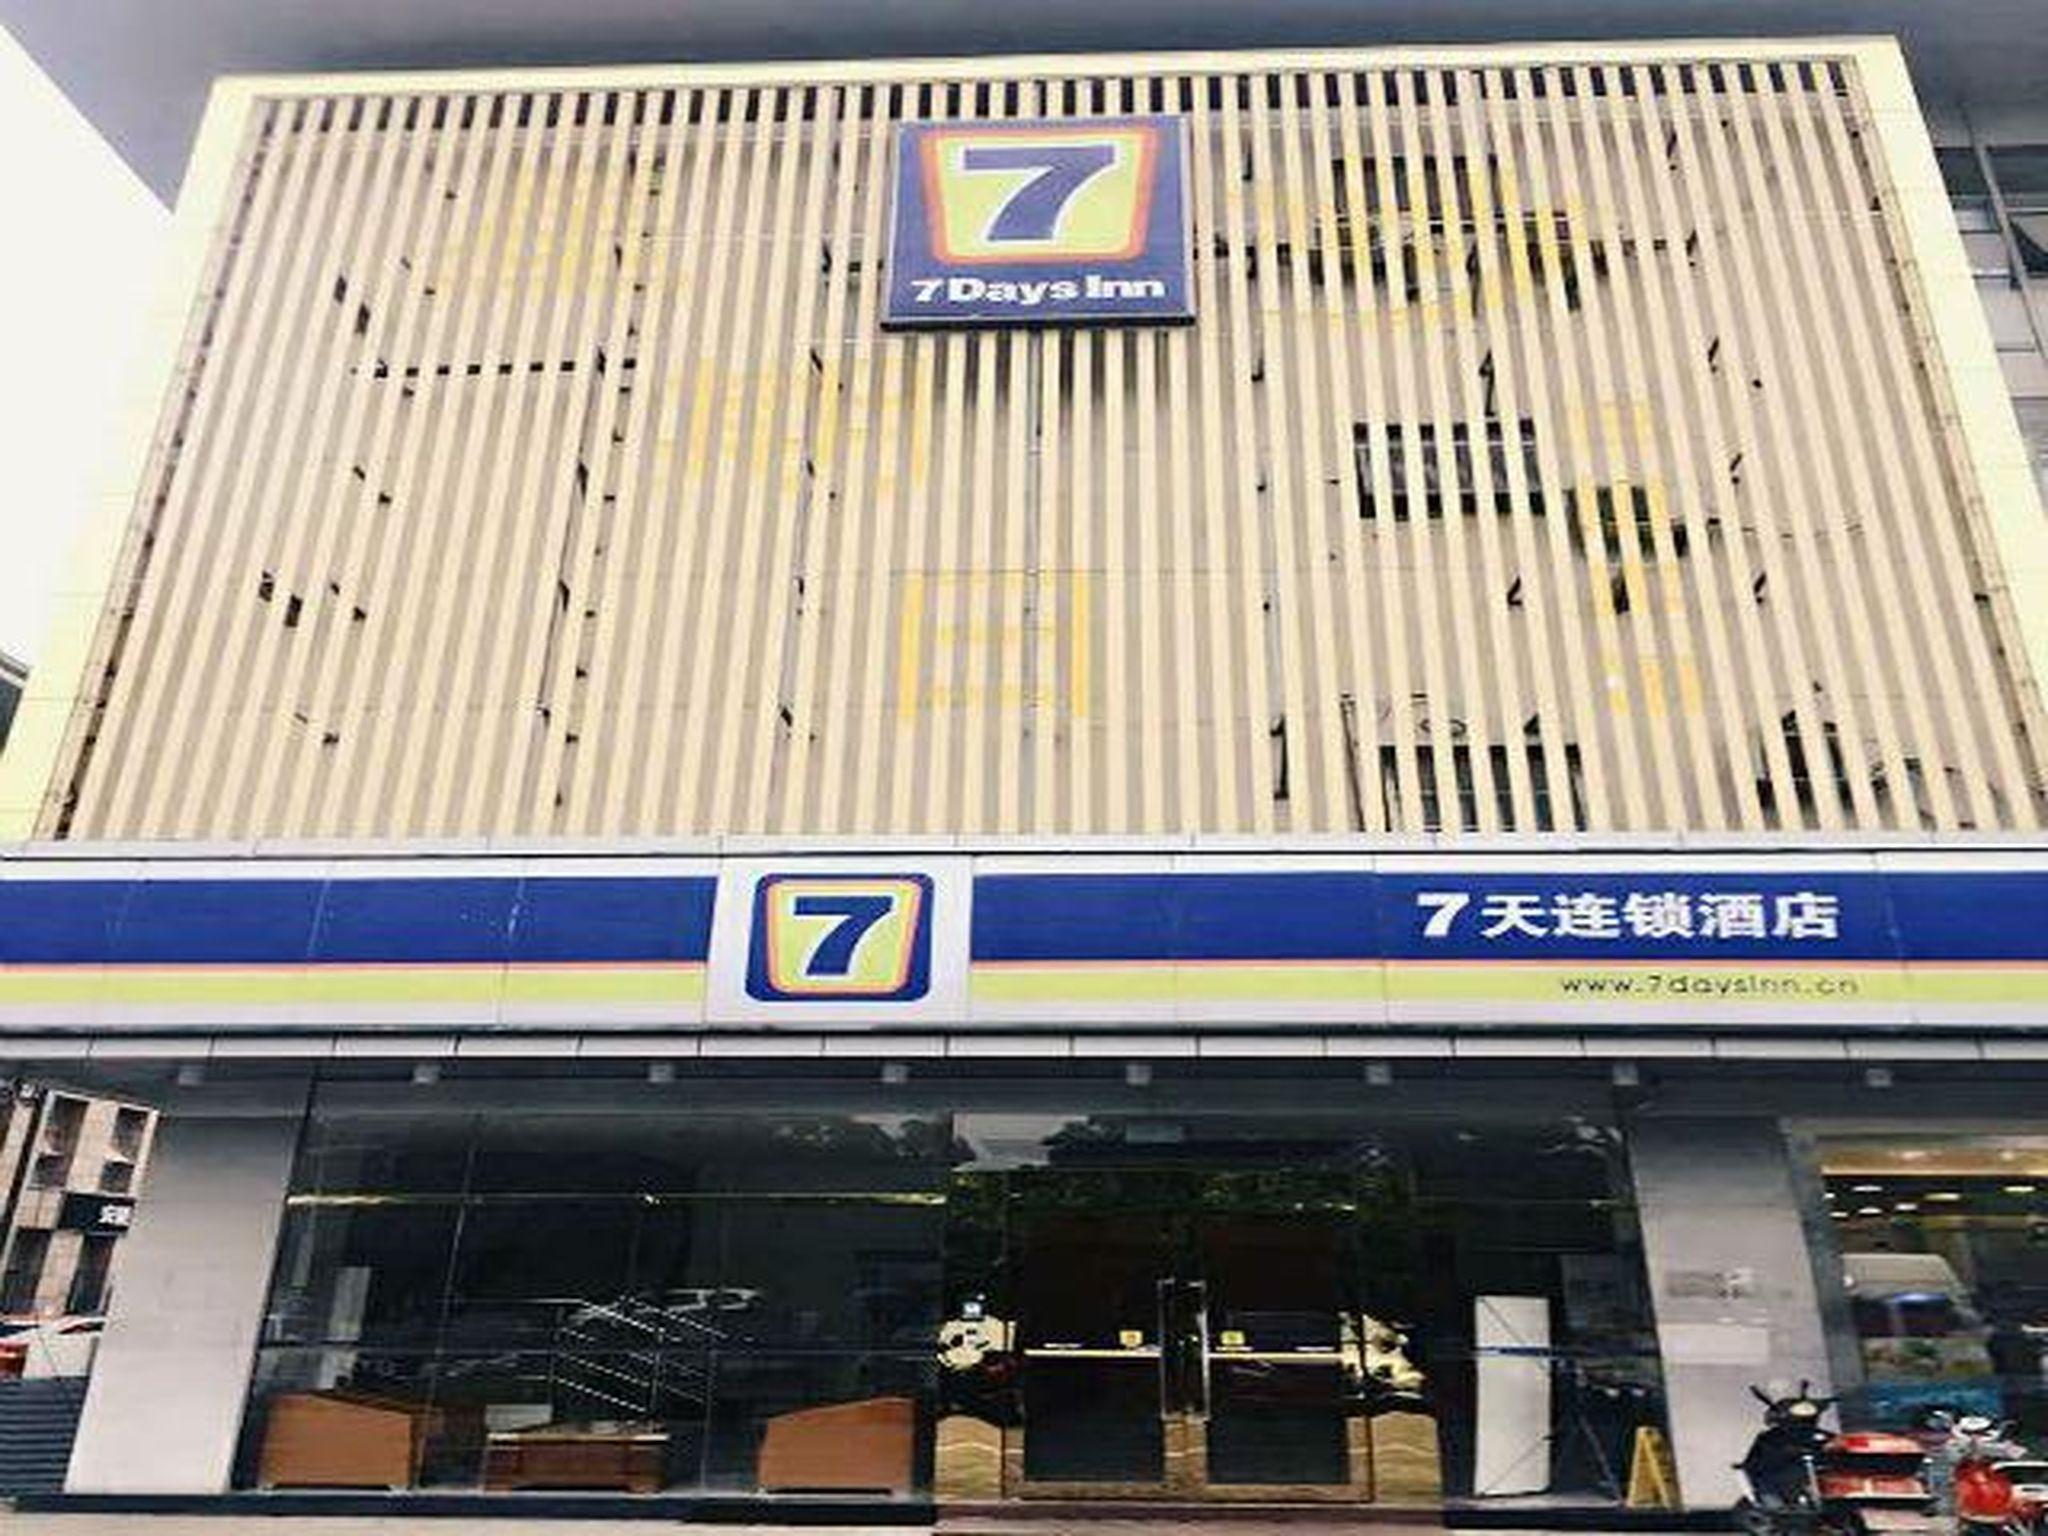 7 Days Inn Suzhou Wei Ting Branch